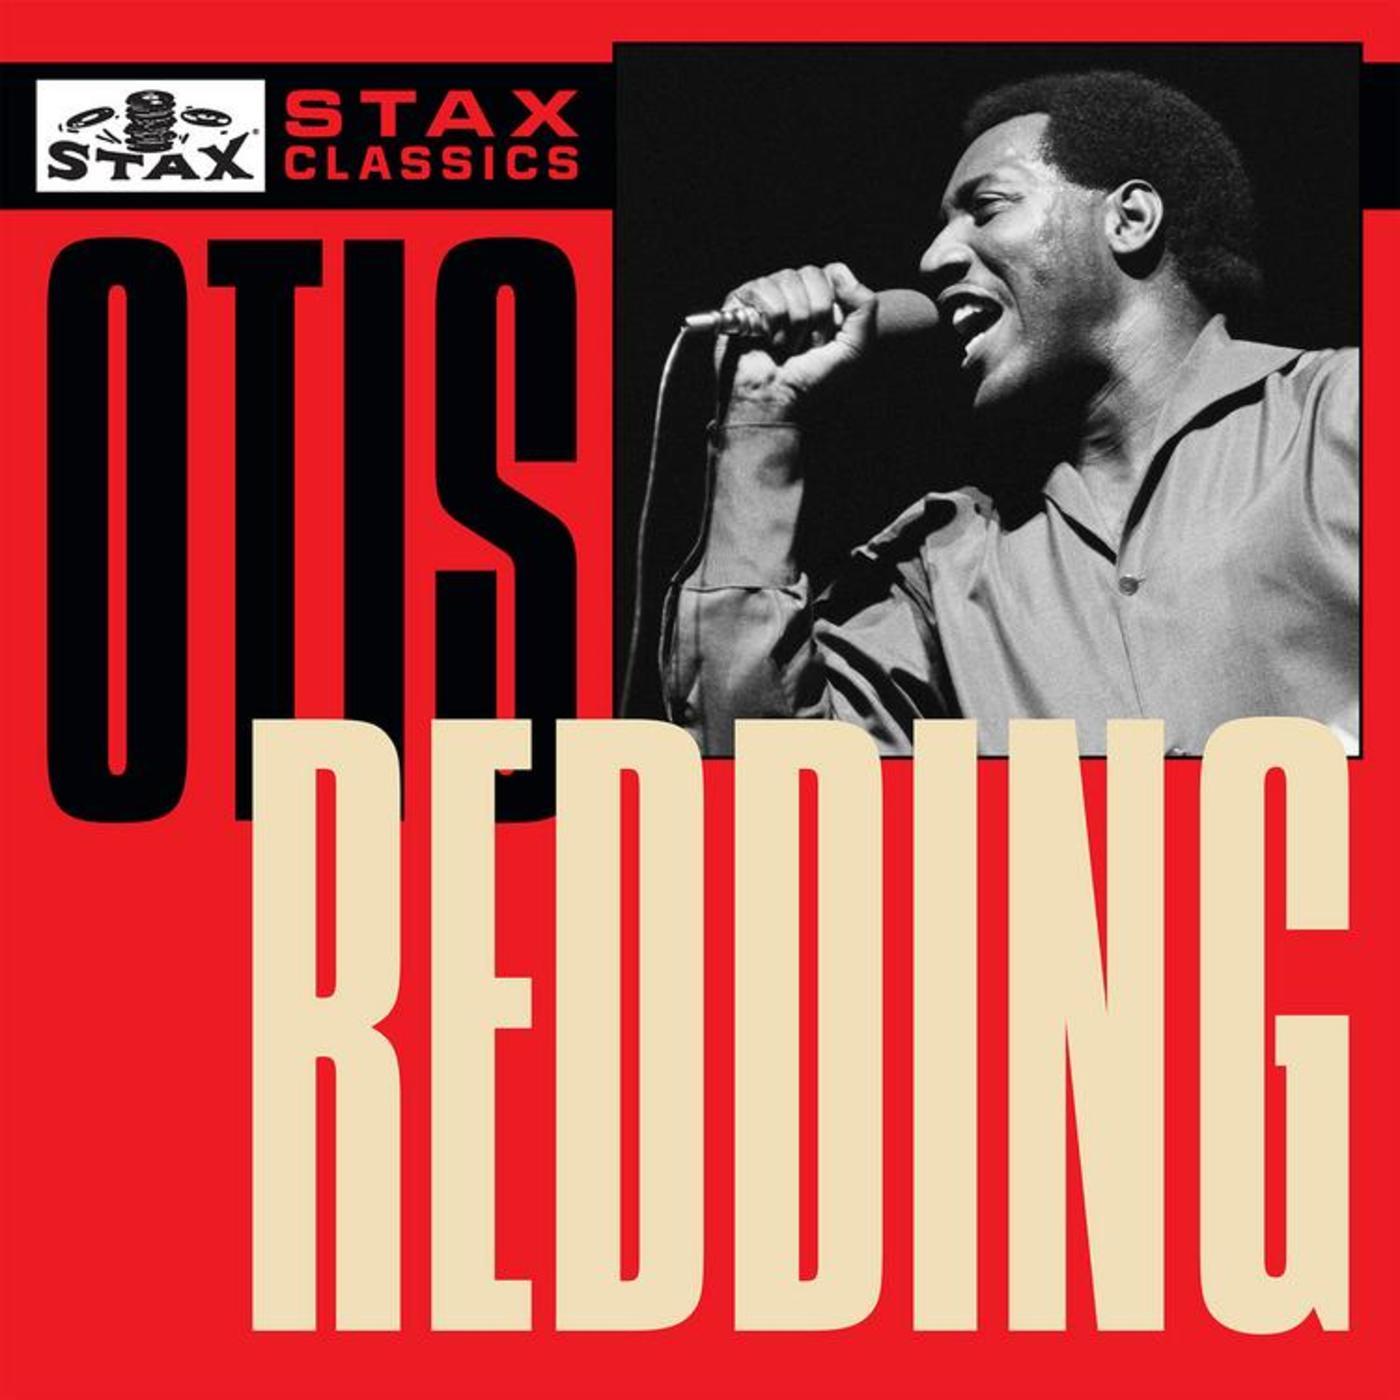 Otis Redding - Stax Classics (Otis Redding) | Rhino